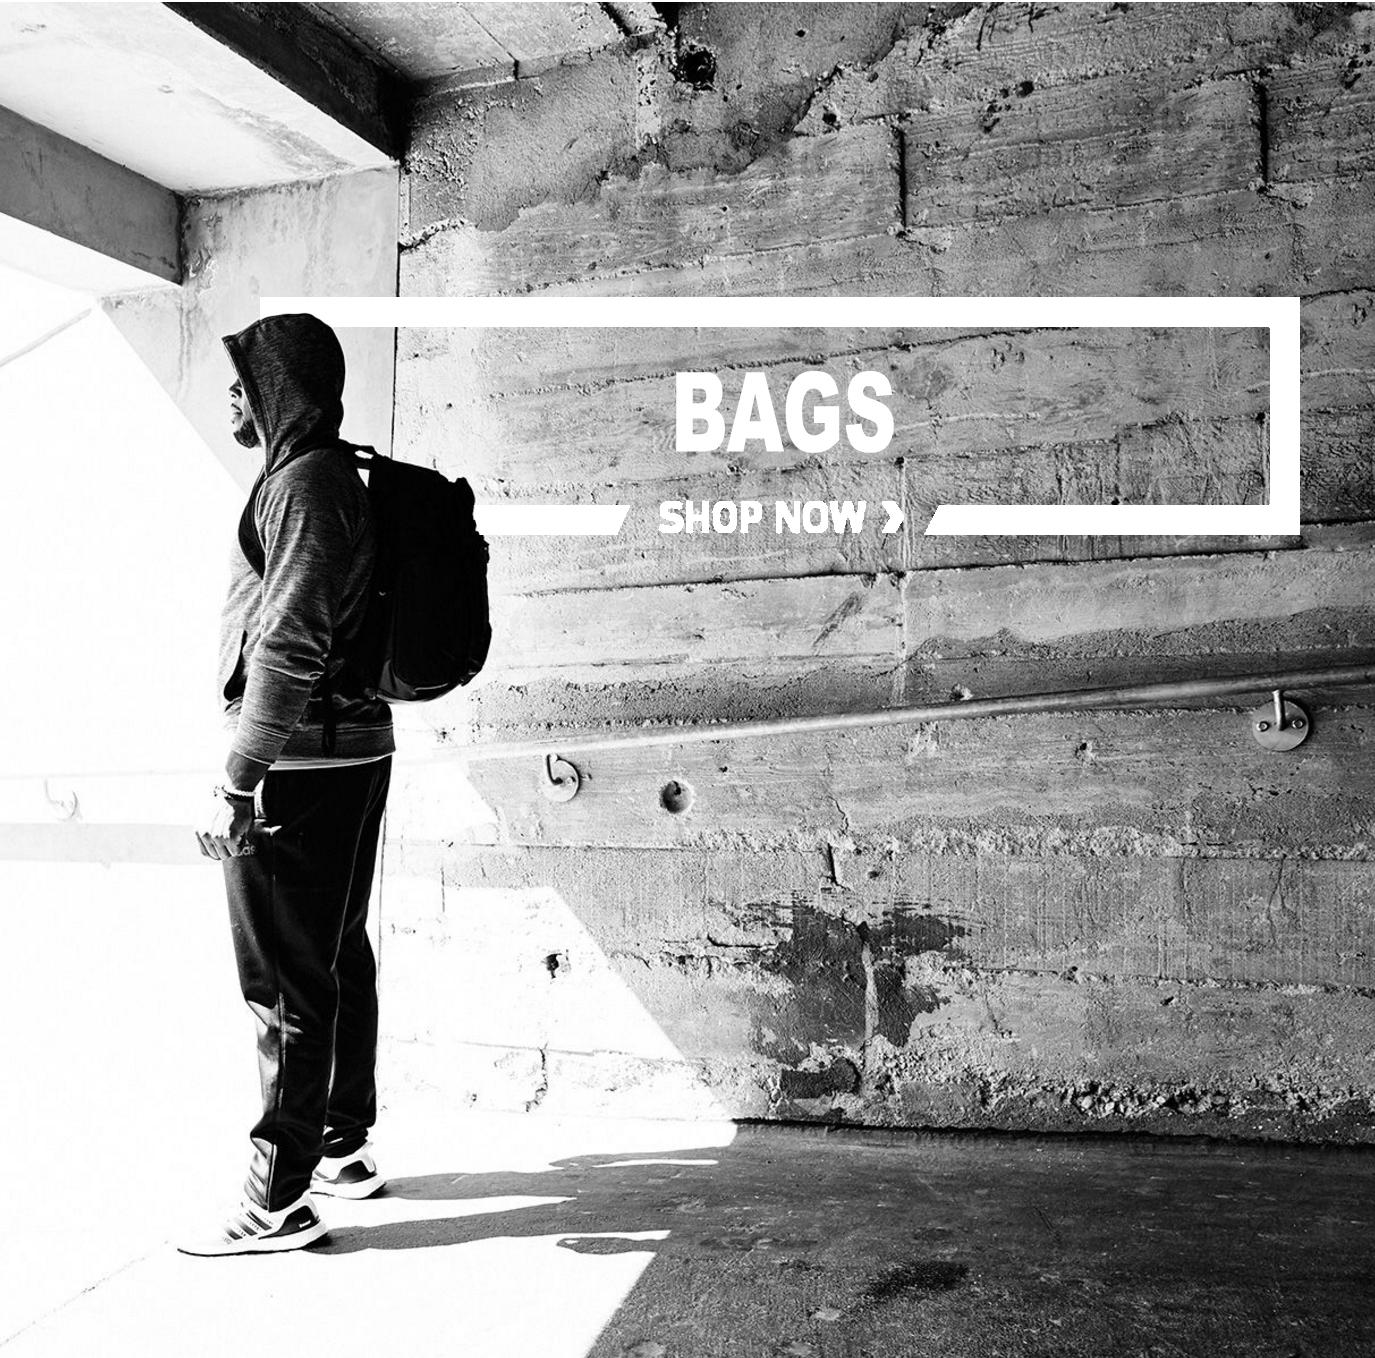 bags_icon_neww.jpg